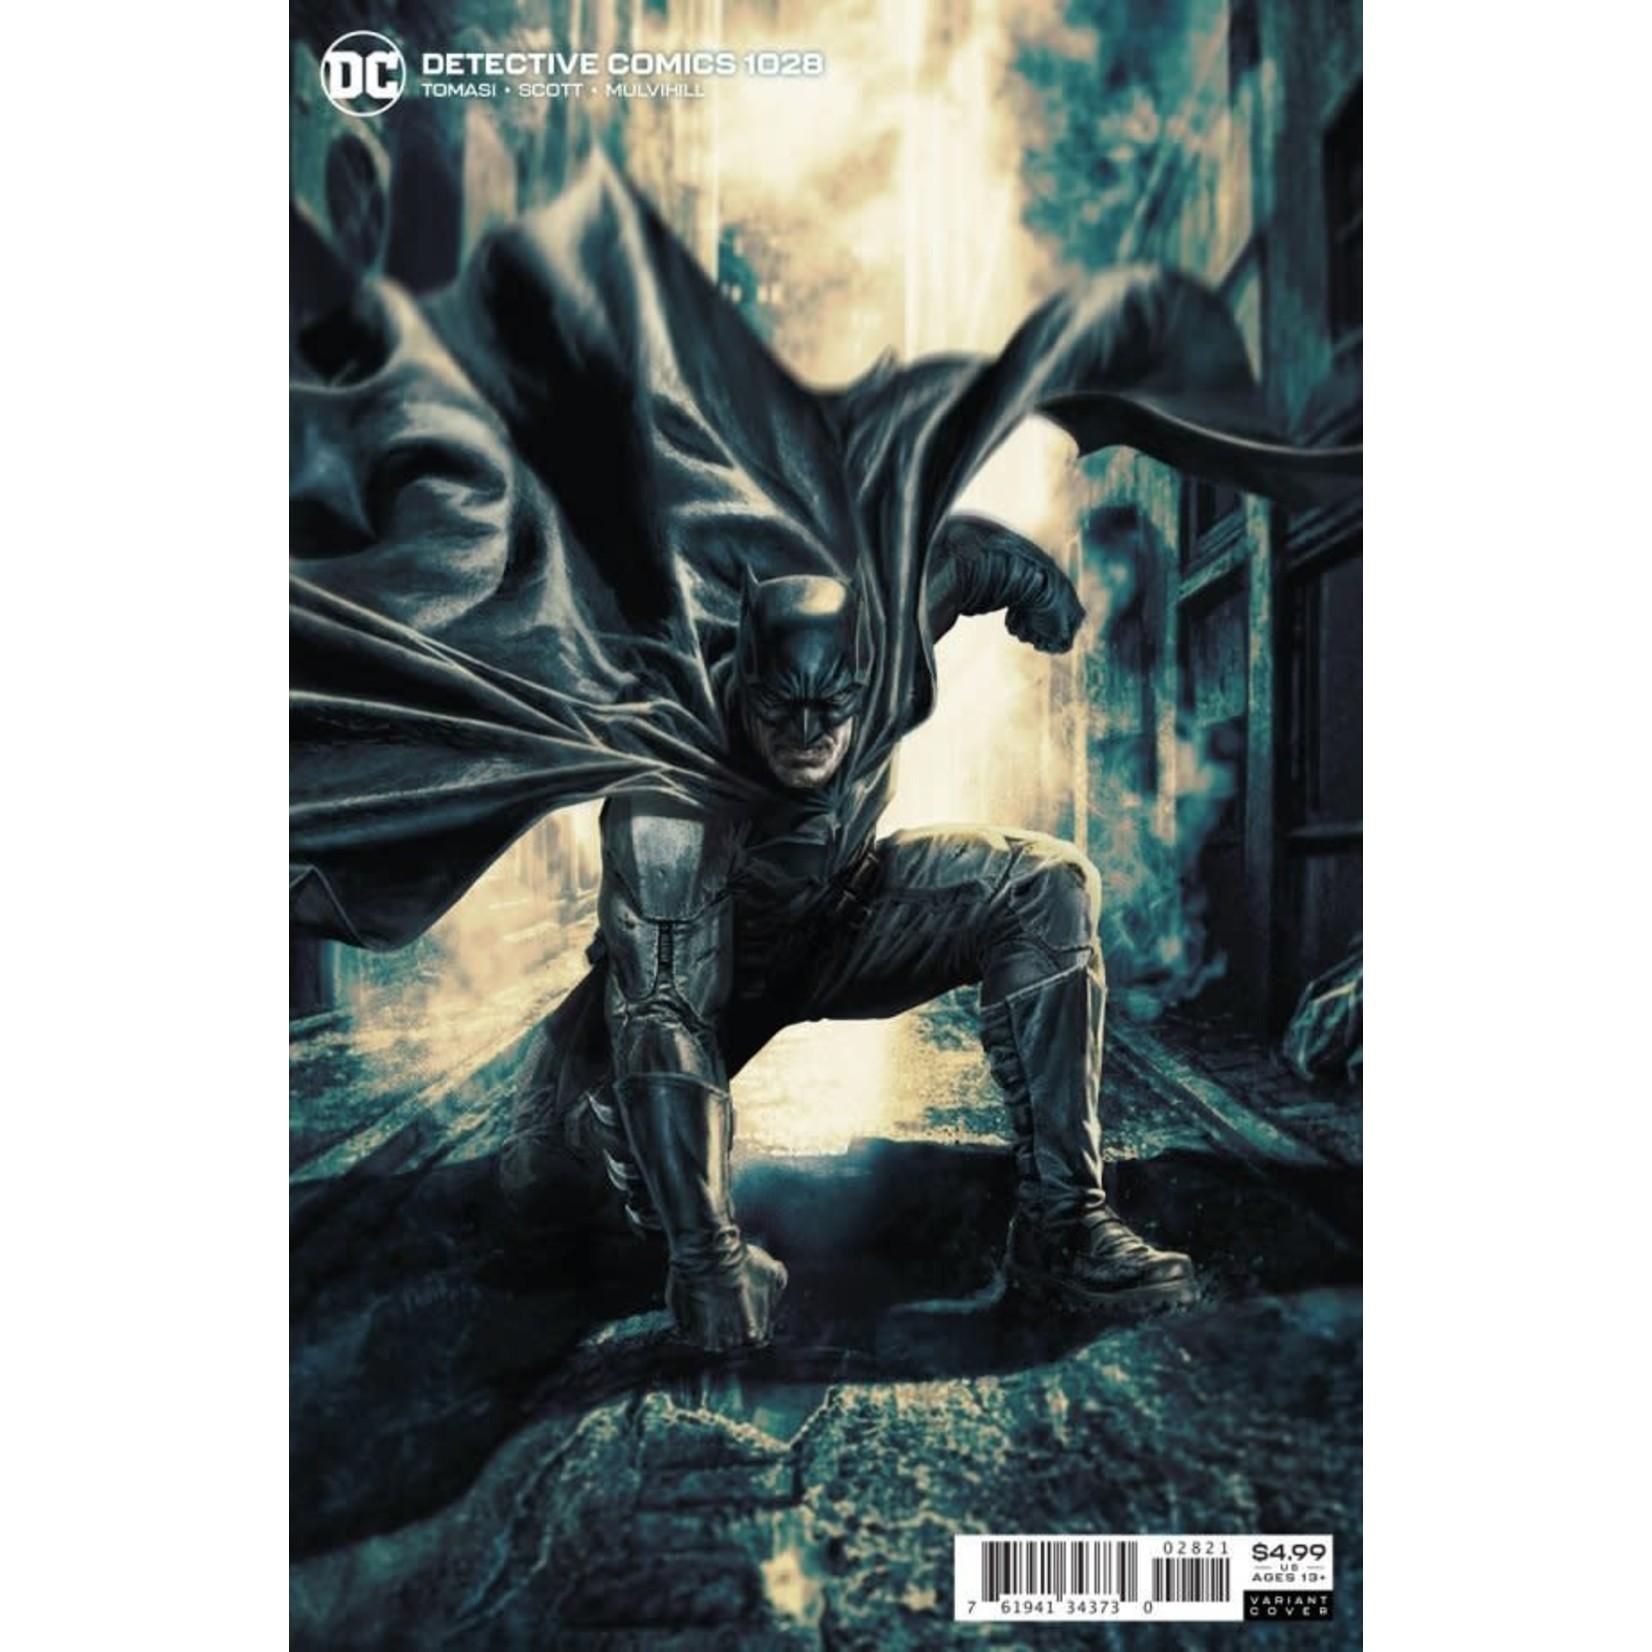 DC Comics Detective Comics #1028 Card Stock Variant Edition by Lee Bermejo